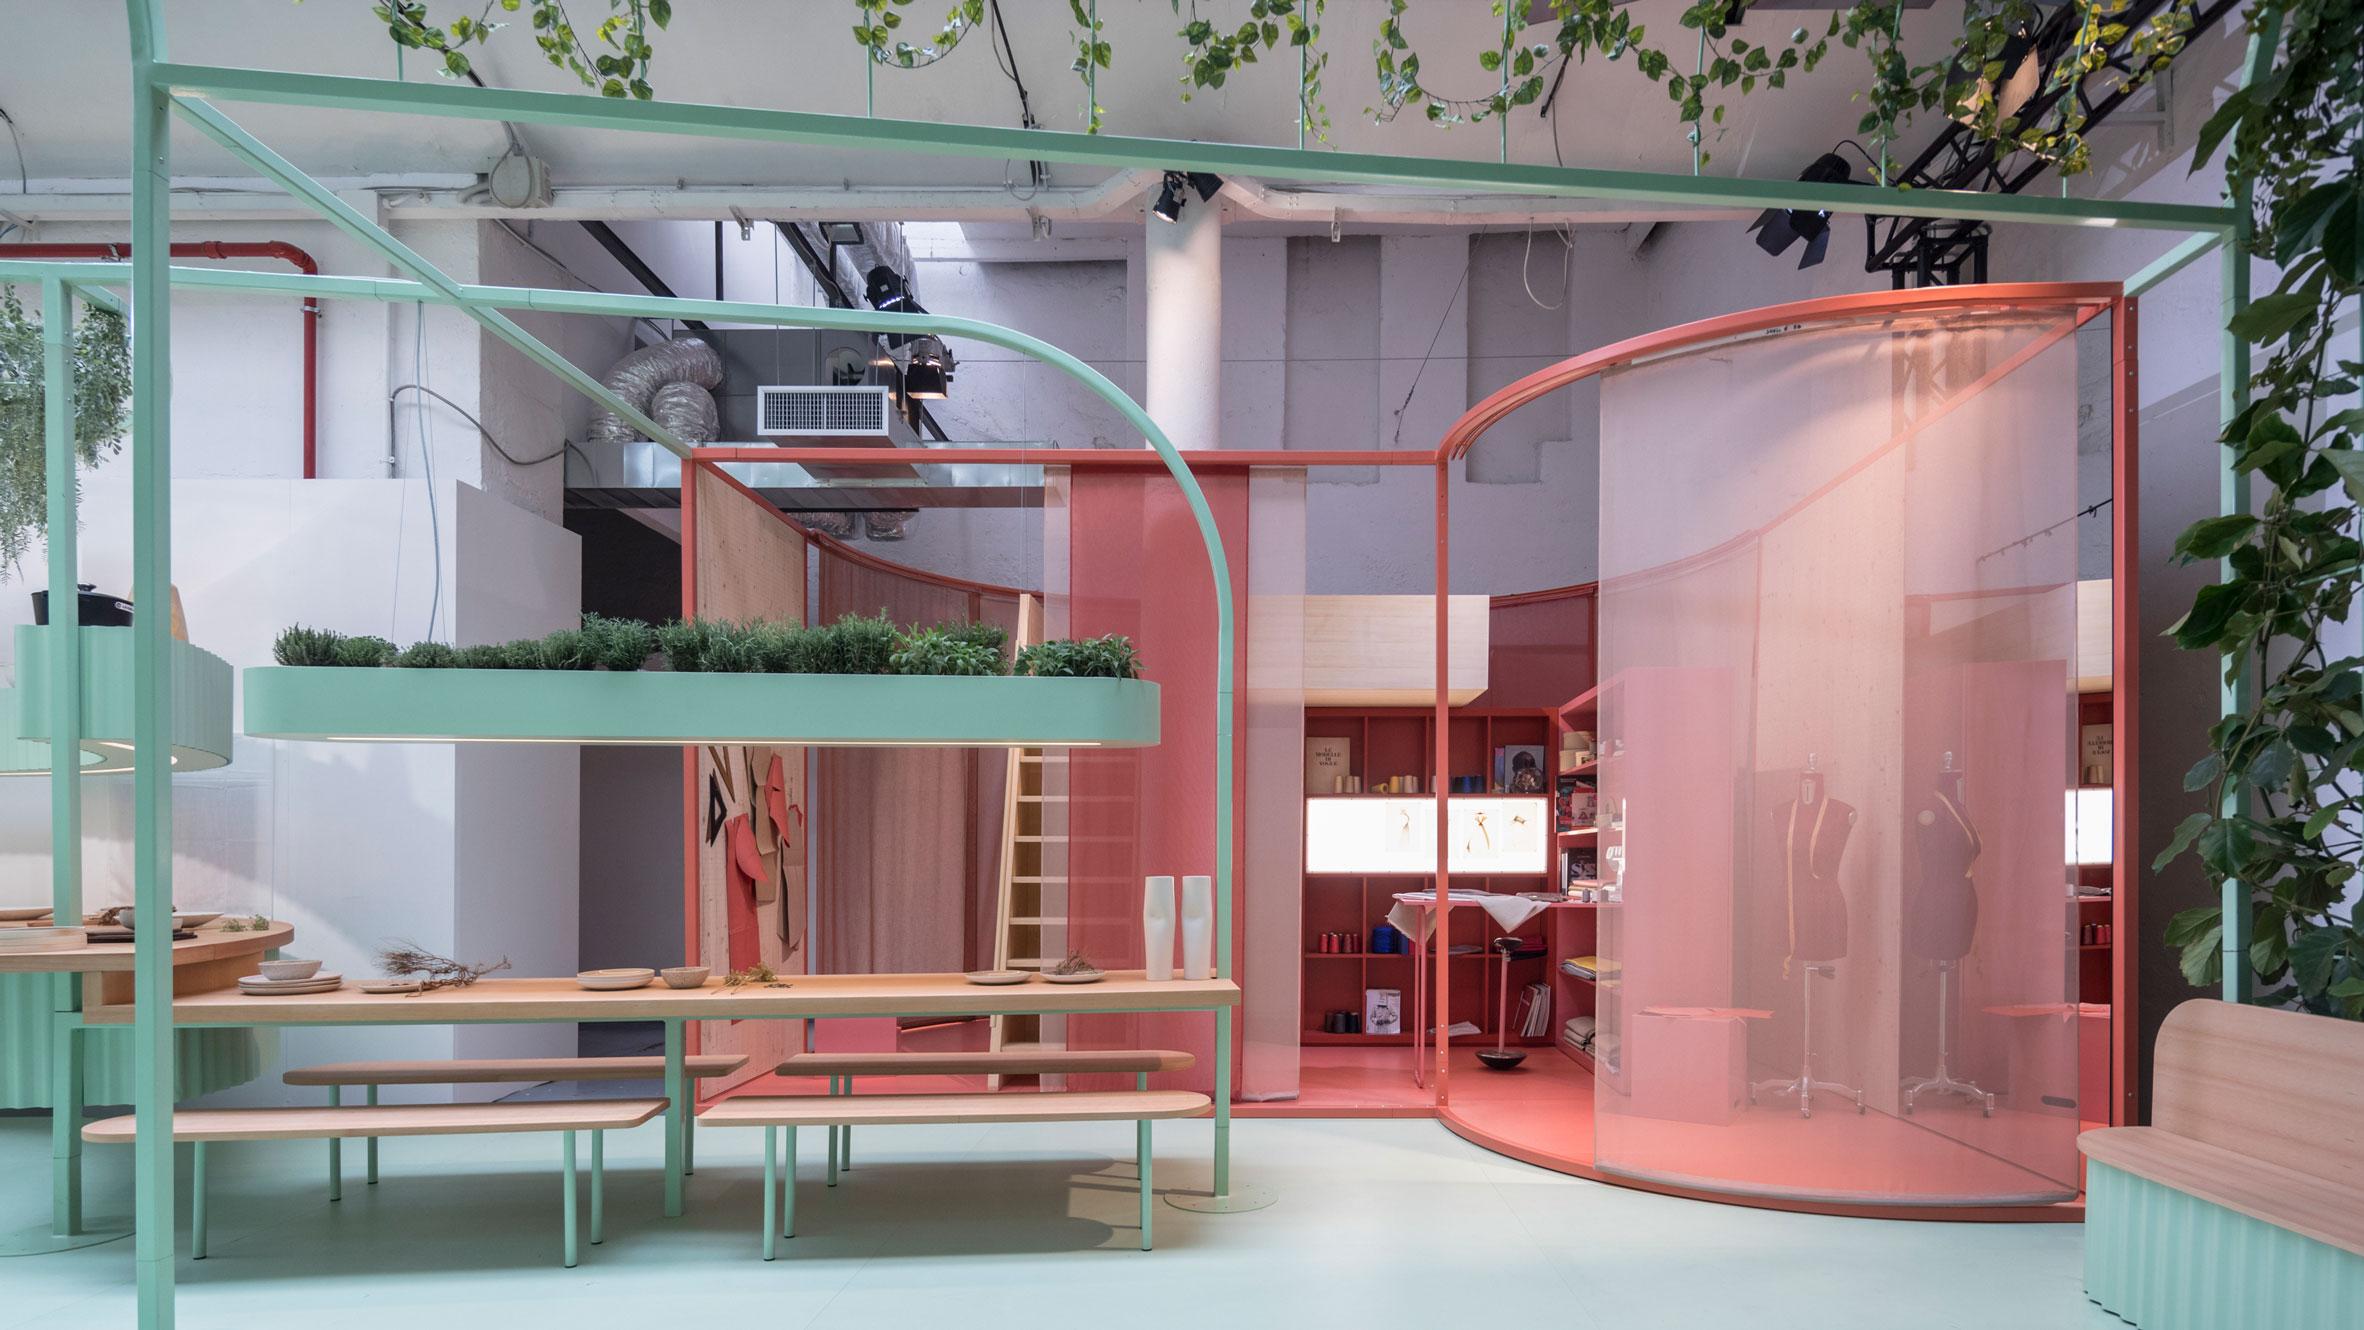 Studiomama Creates Colourful Capsule Homes For MINI Living Installation